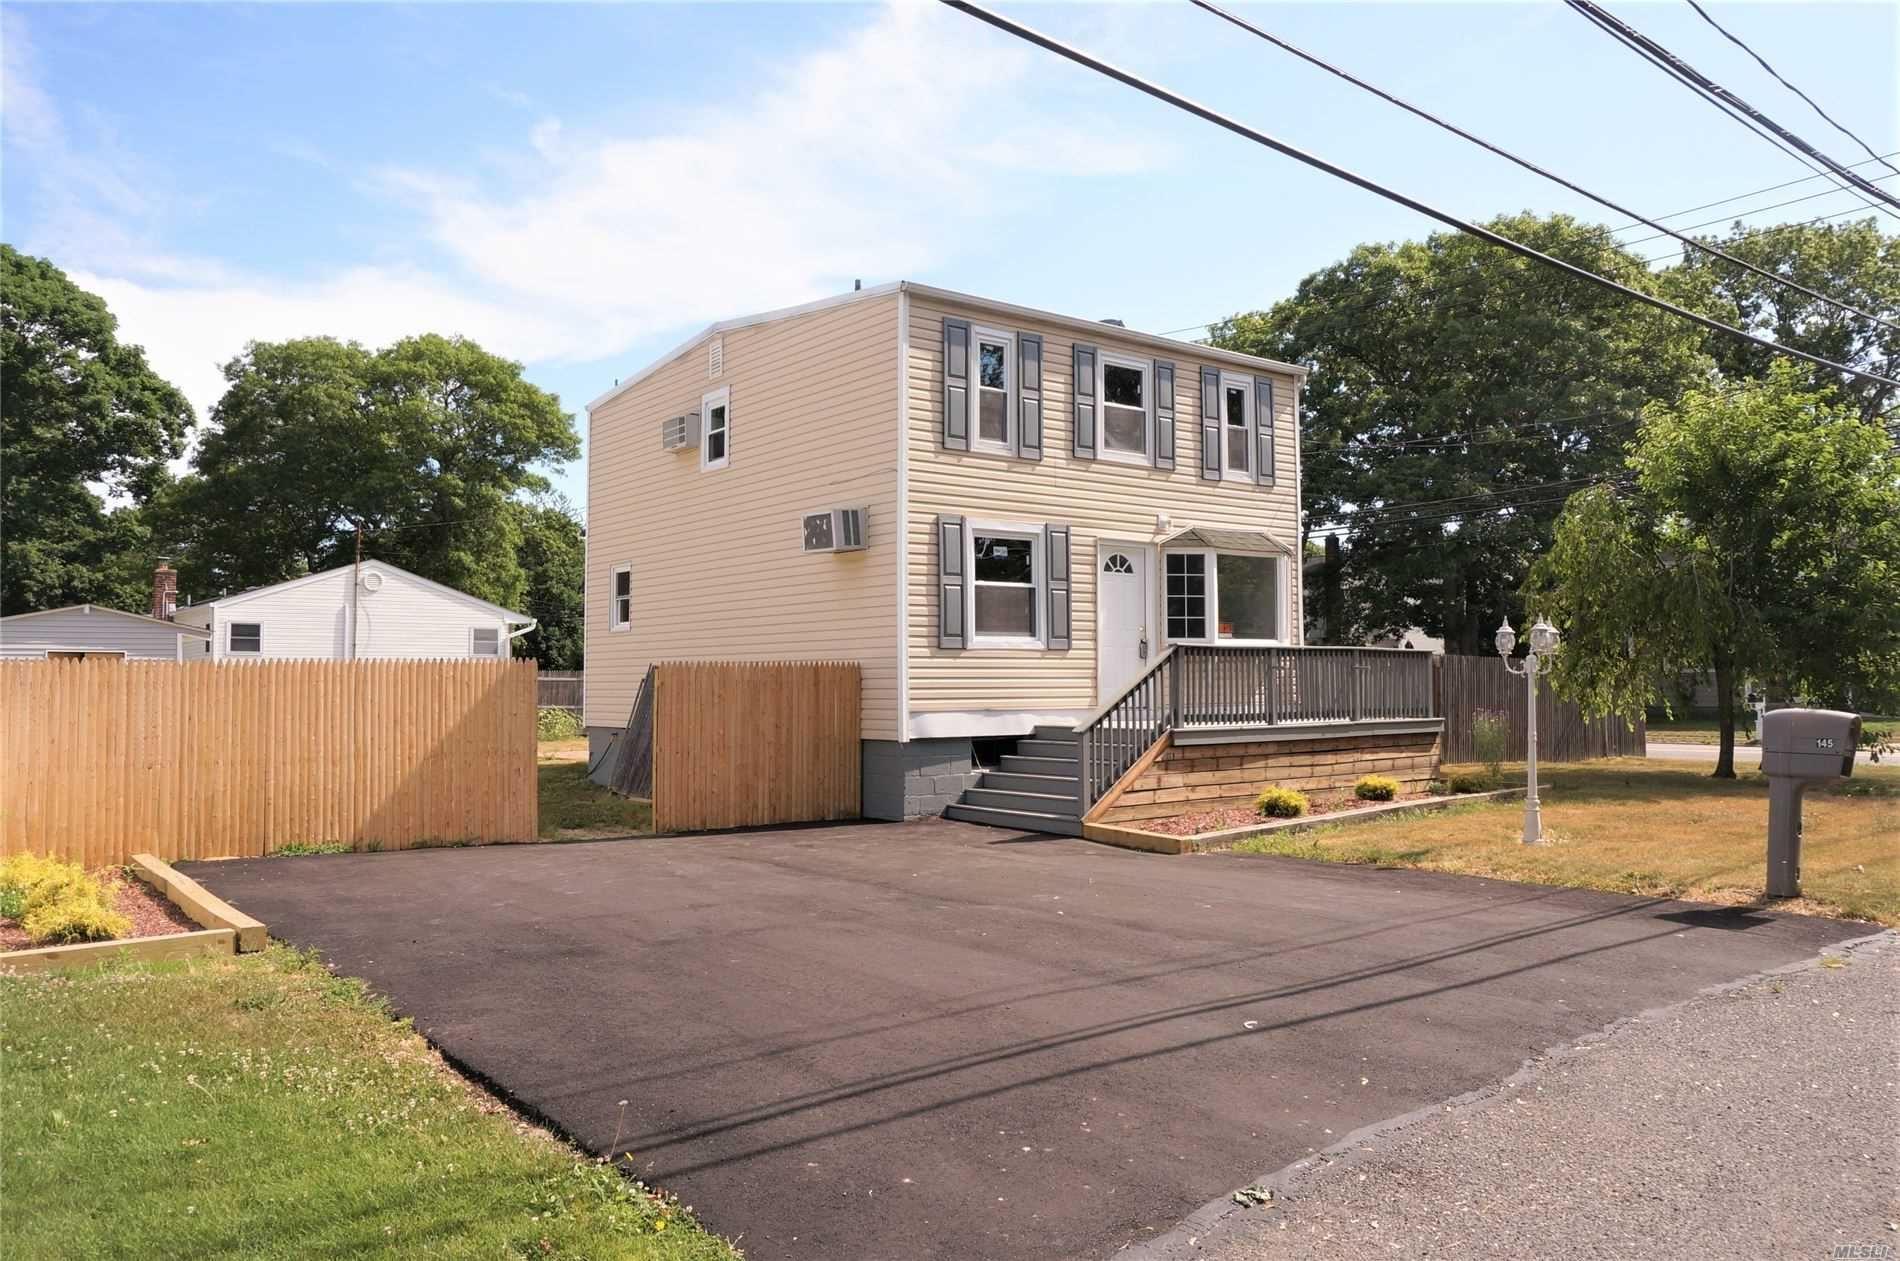 145 Schmidt Avenue, Holbrook, NY 11741 - MLS#: 3238611